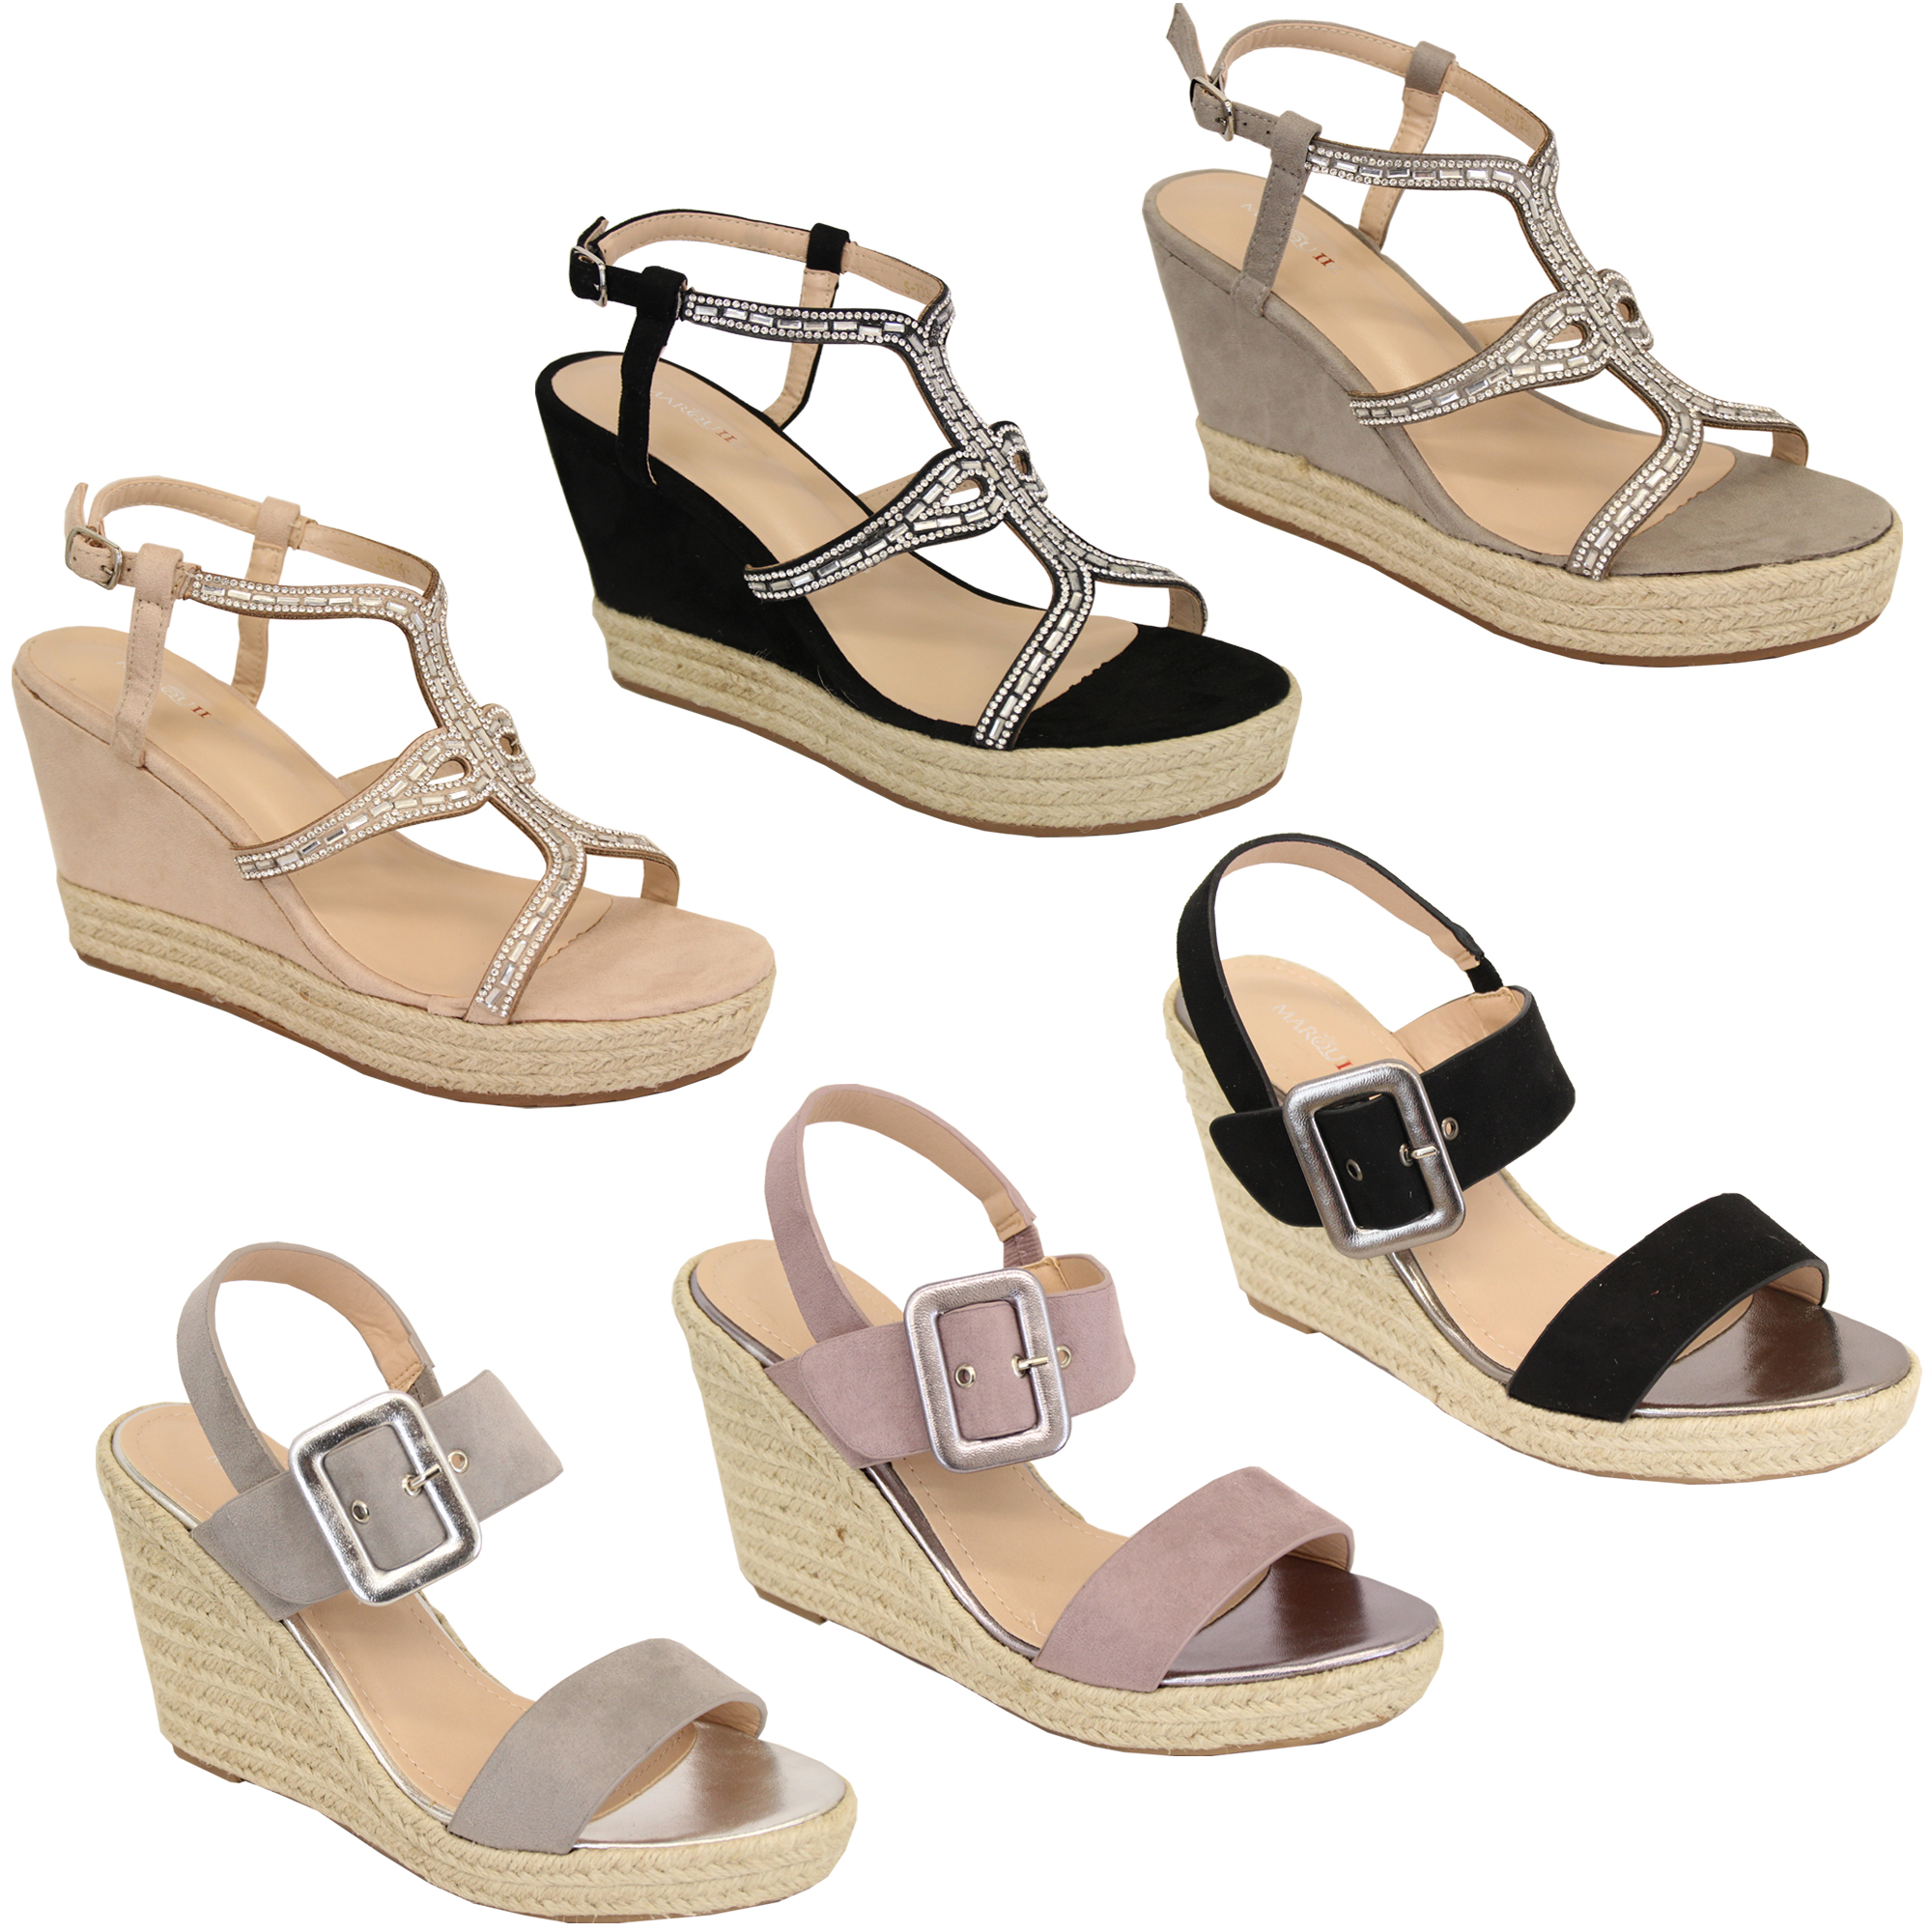 Scarpe da donna sandali beige con zeppe alte e plateau 39 40 cinturino spuntate